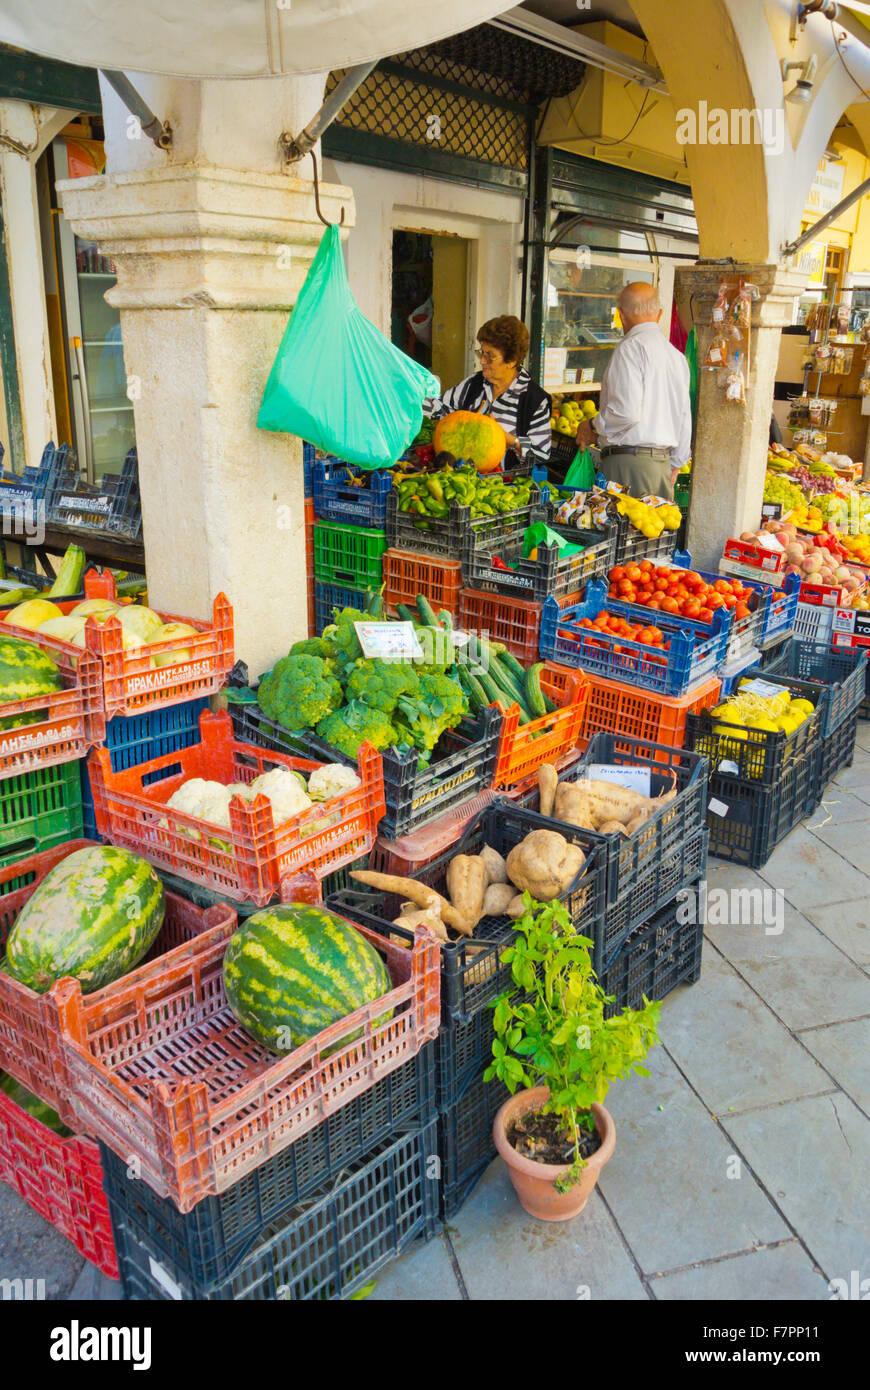 Lebensmittel Shop, Nikiforou Theotoki Straße, alte Stadt, Korfu, Ionische Inseln, Griechenland Stockbild